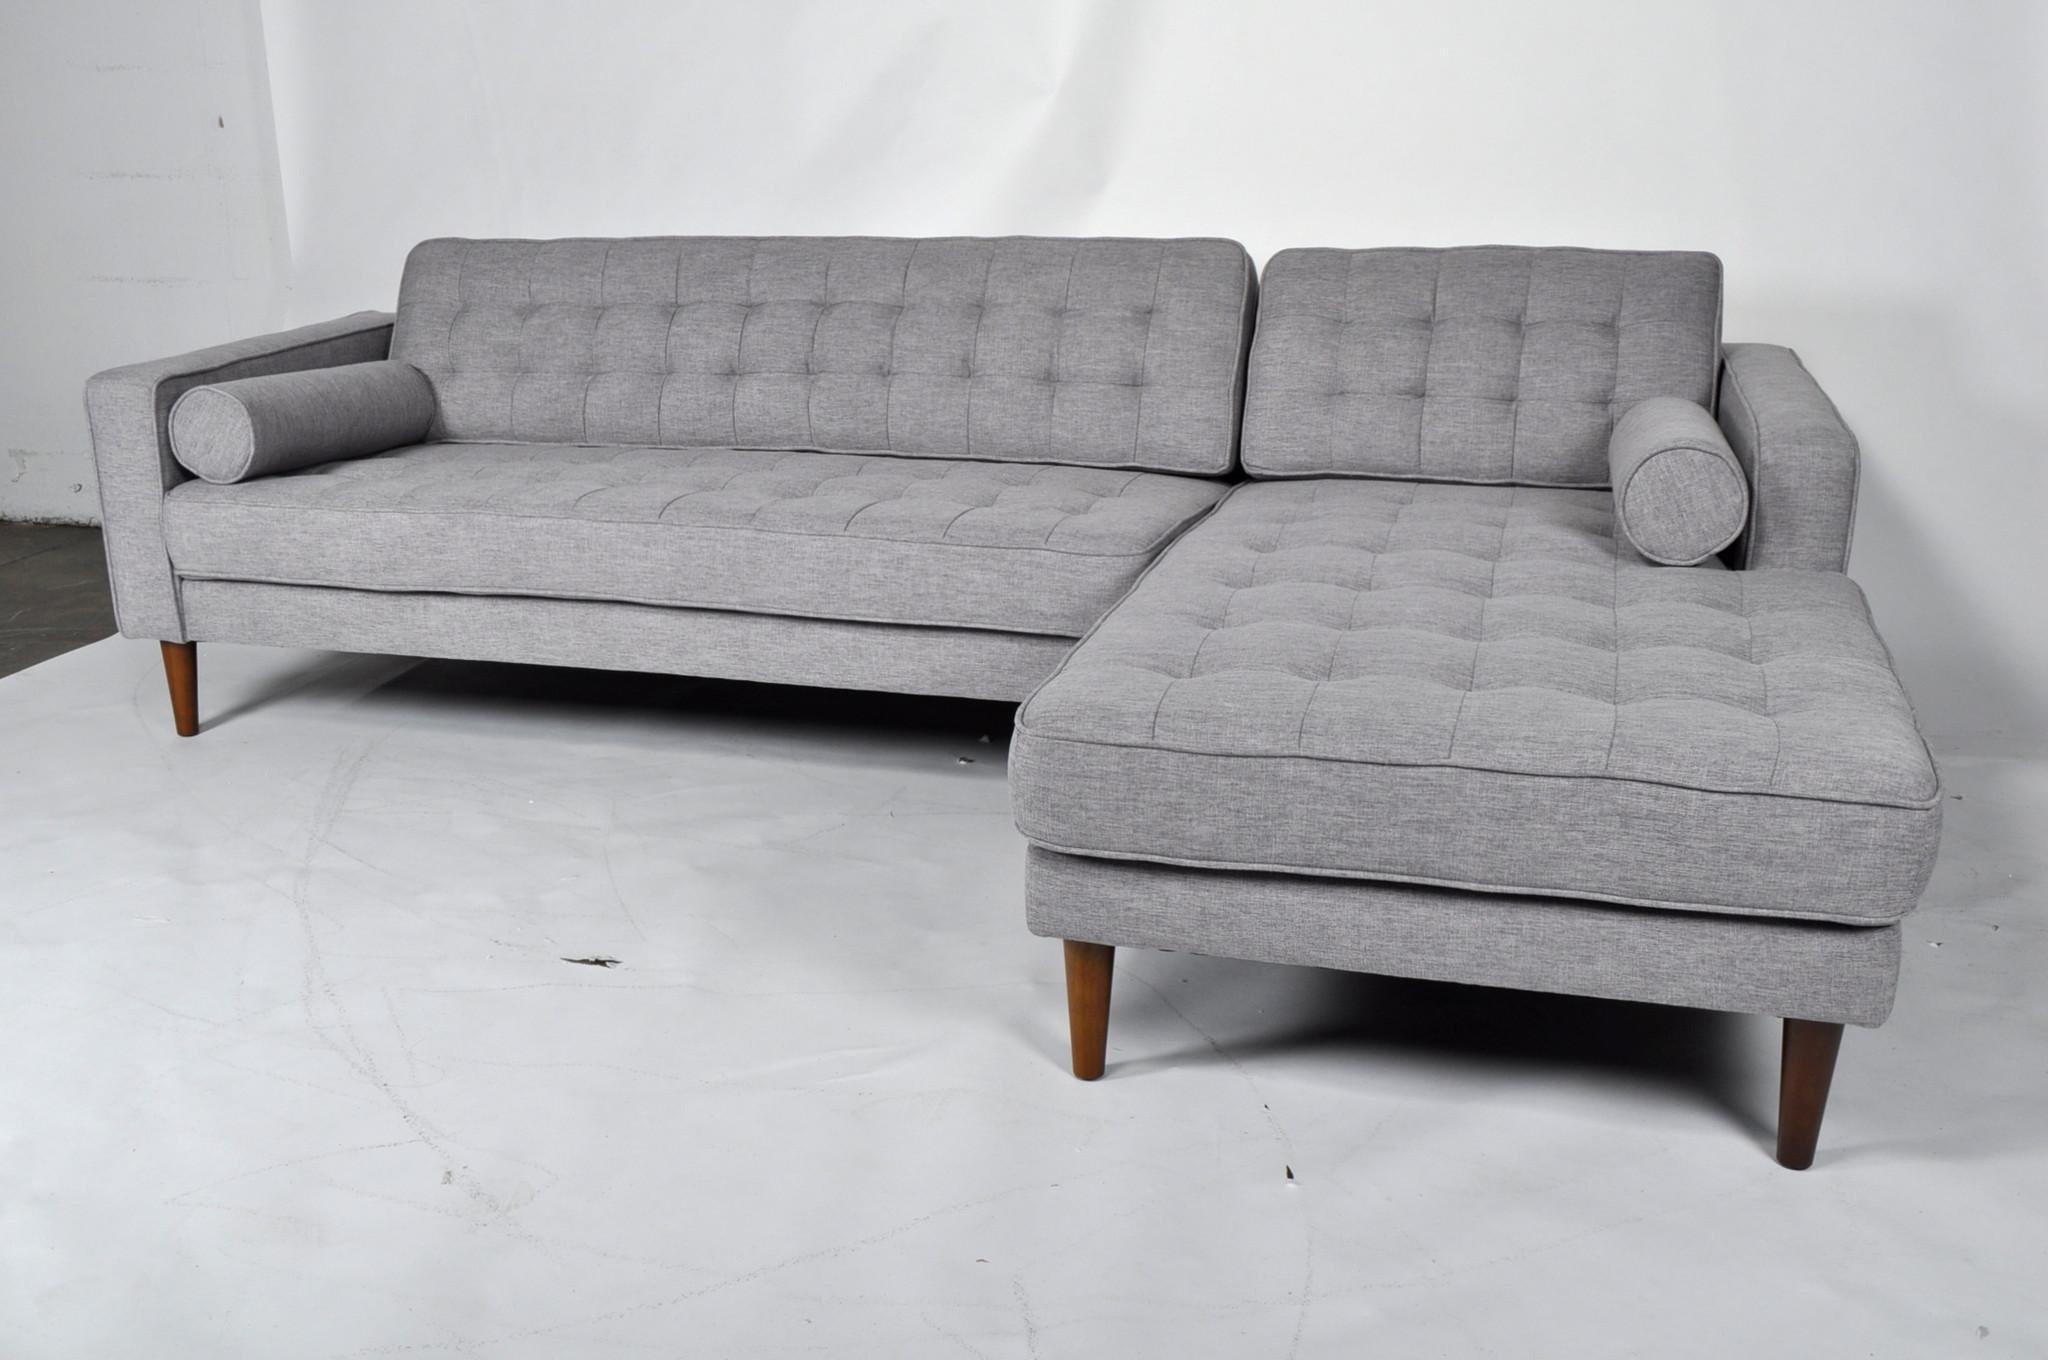 Bradley Sectional Sofa 11 With Bradley Sectional Sofa Pertaining To Bradley Sectional Sofas (Image 11 of 20)